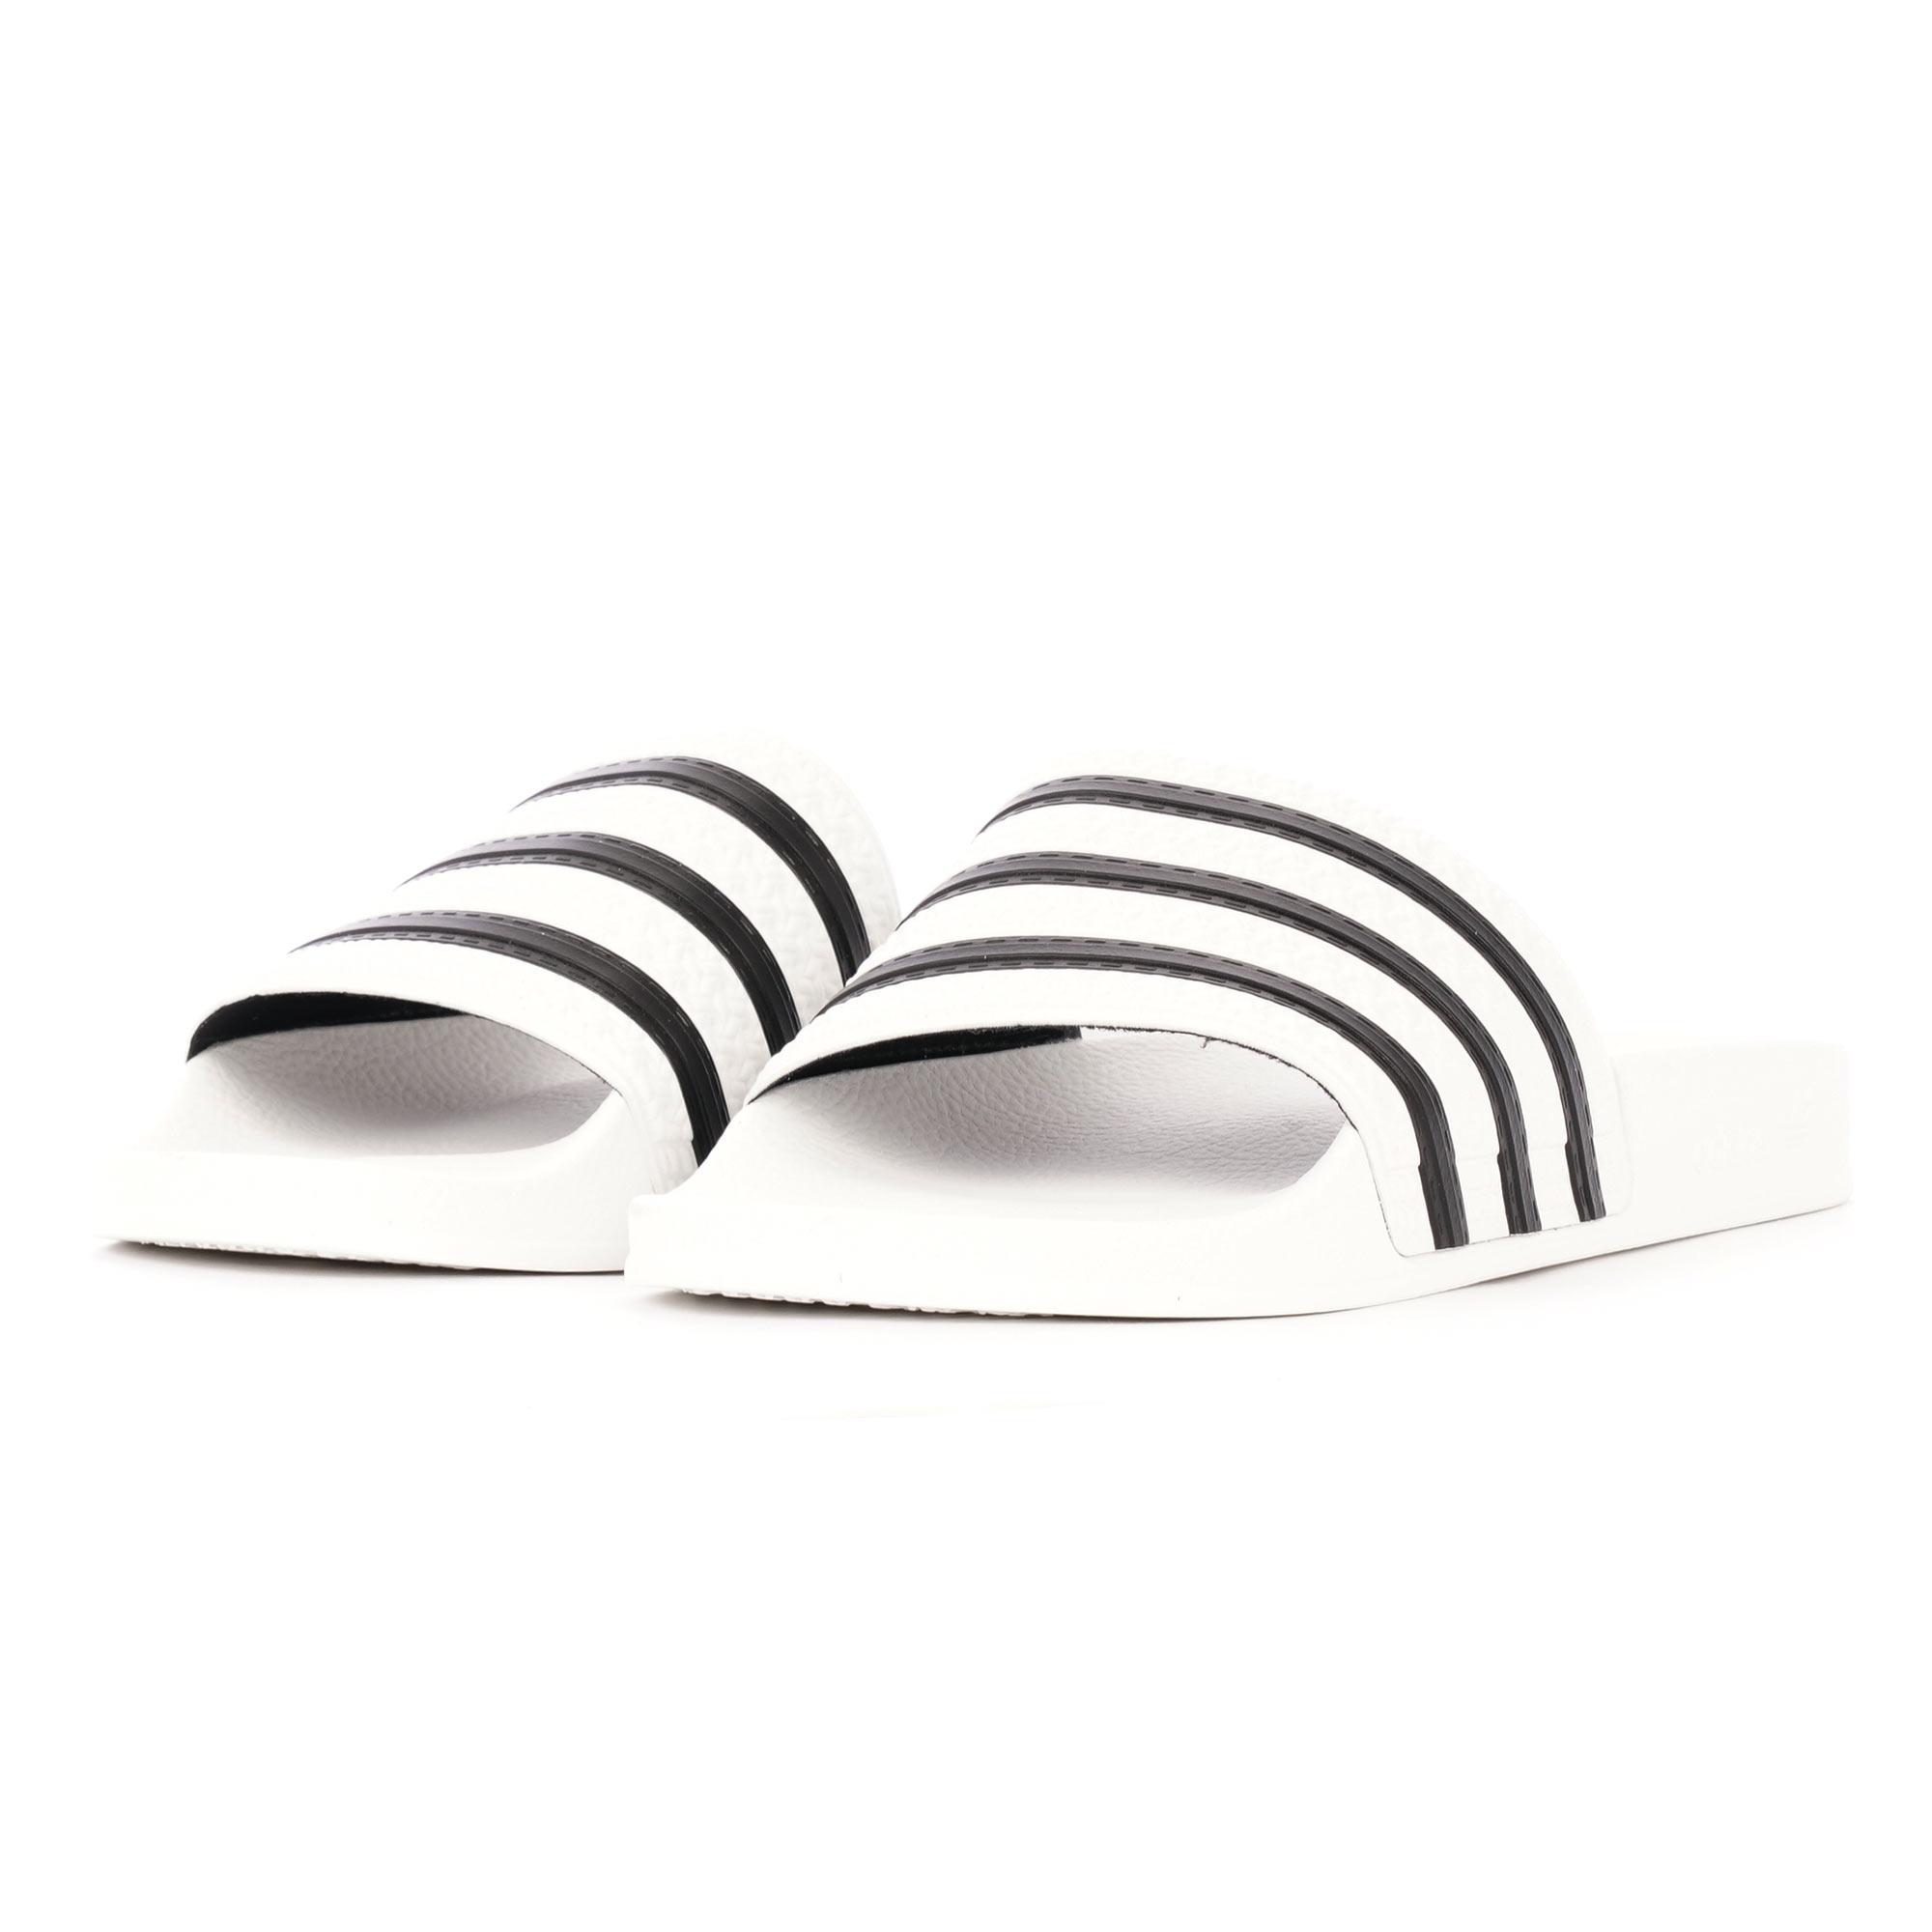 6dff7664abe5 Adilette Slides - White  amp  Core Black